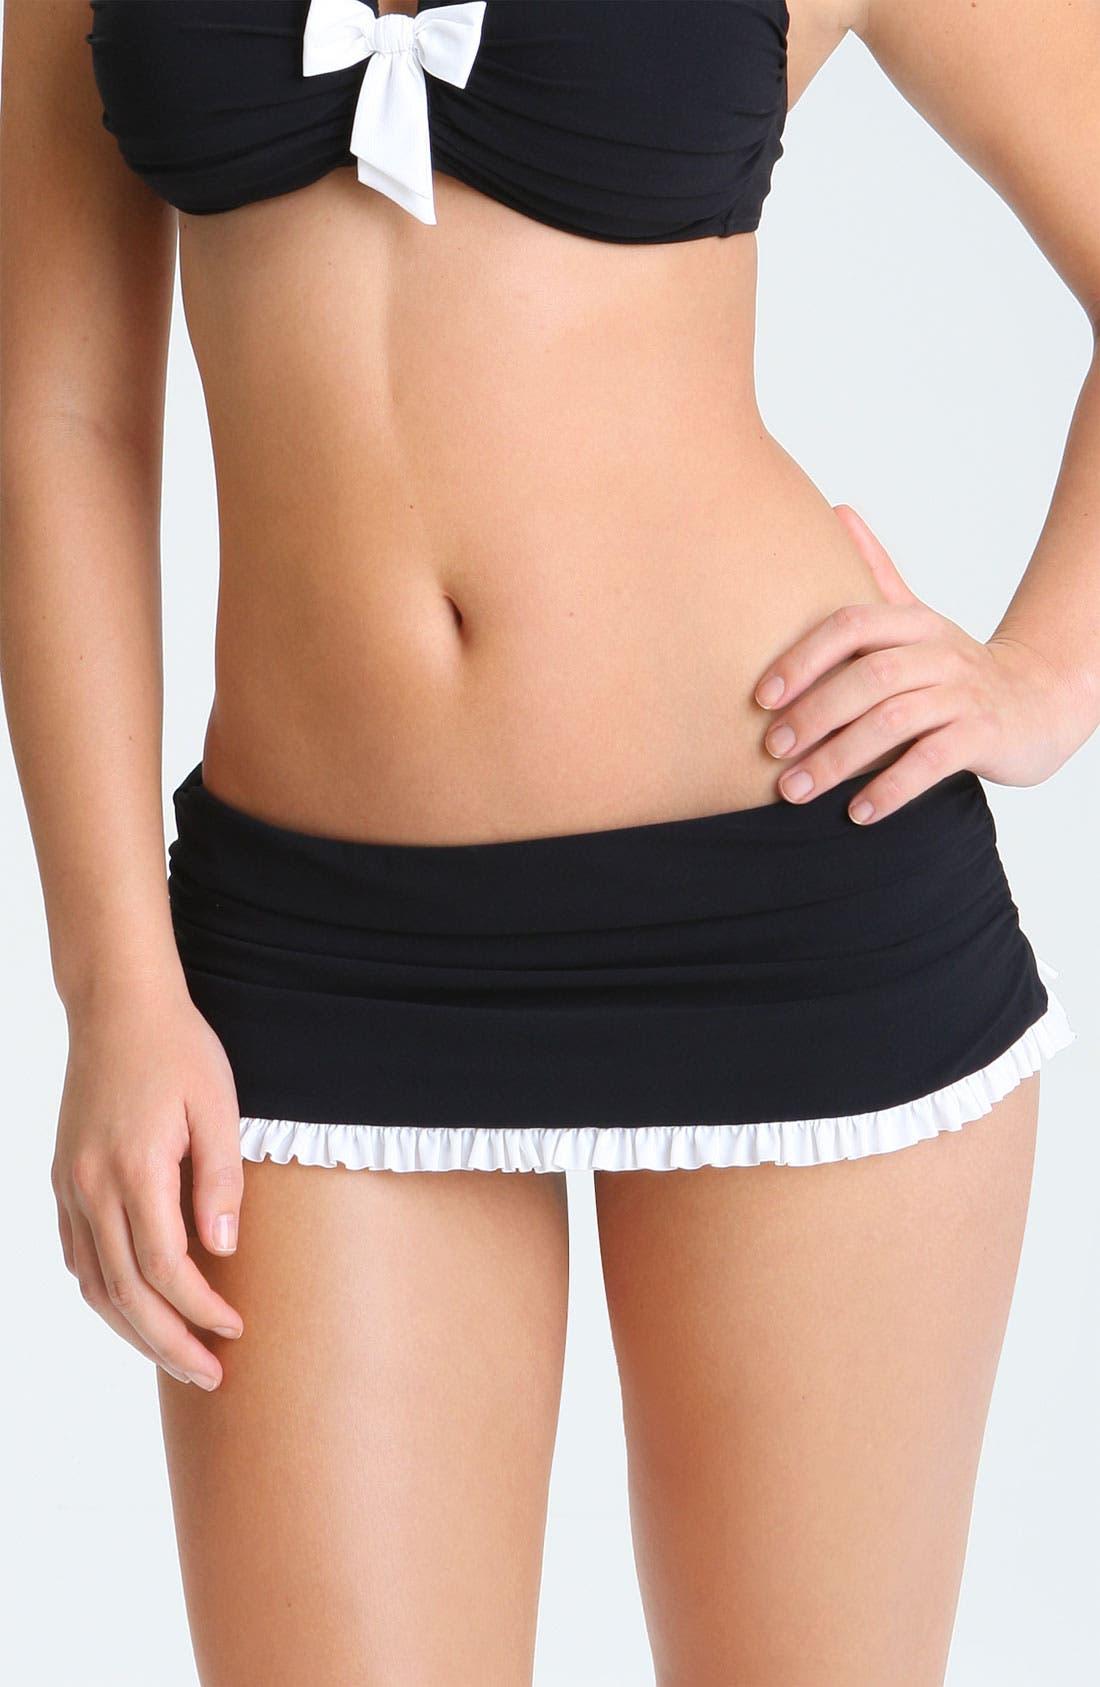 Main Image - Profile by Gottex 'Black Tie' Skirted Bikini Bottoms